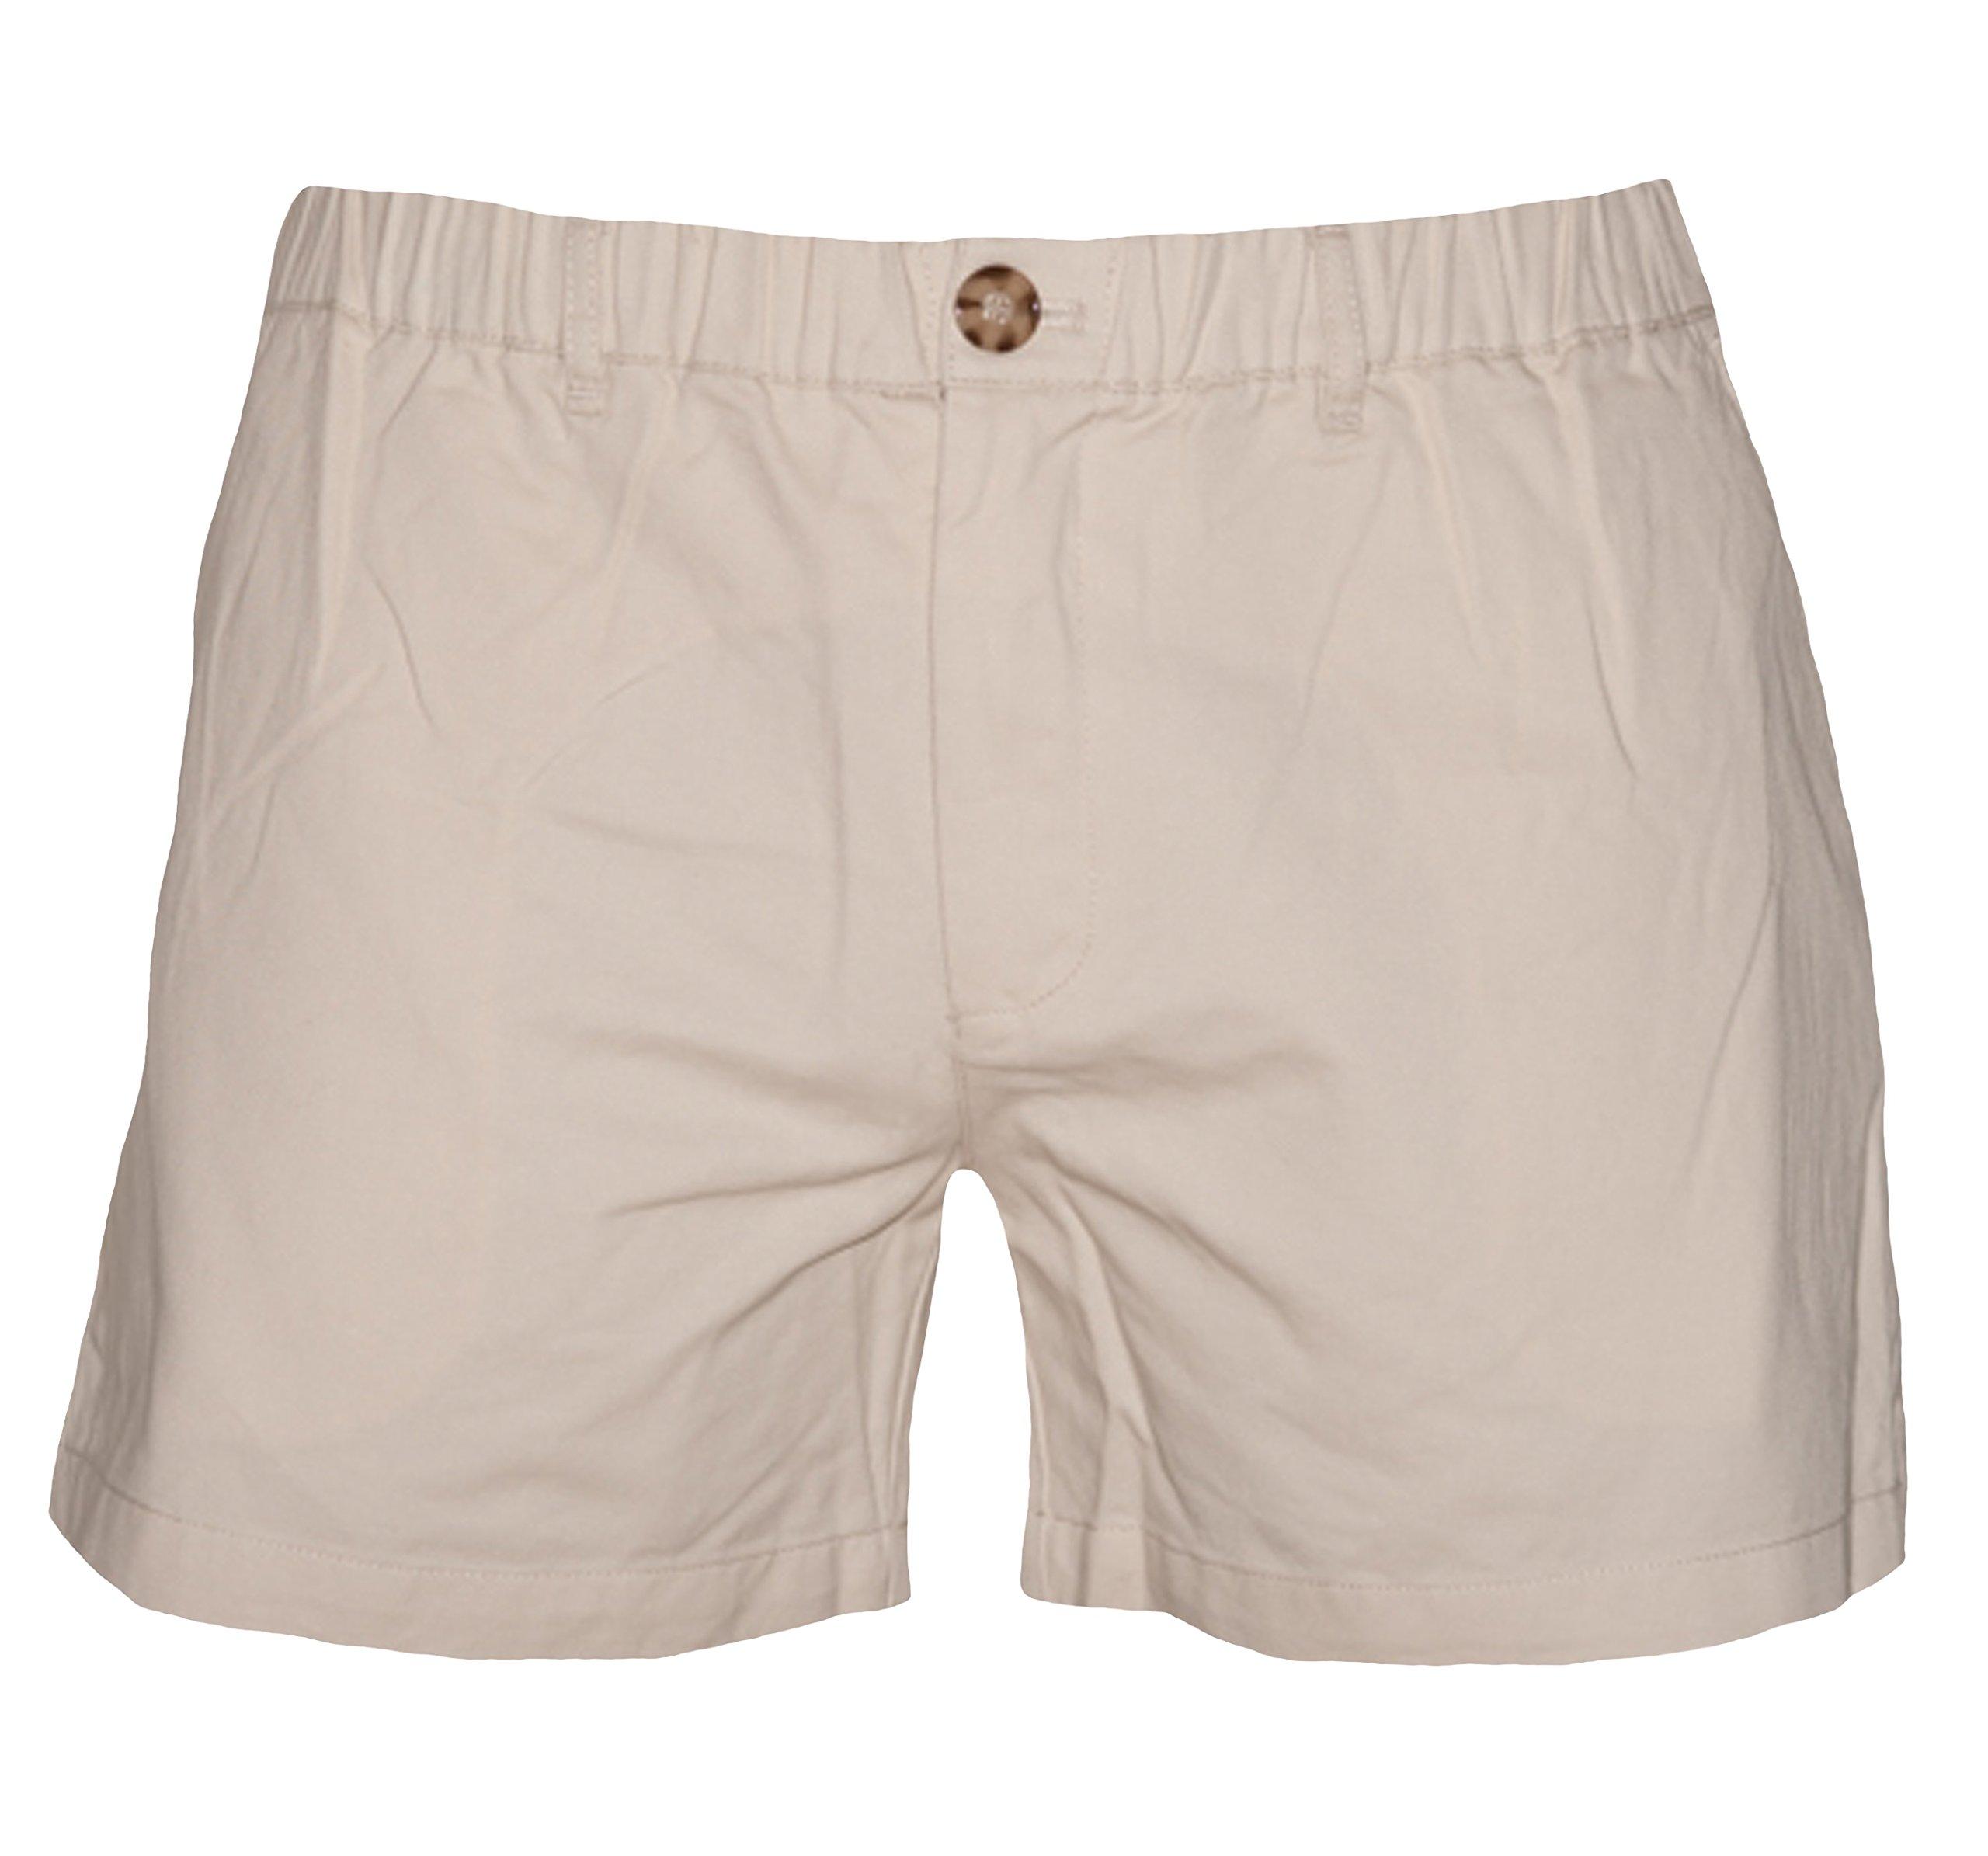 Meripex Apparel Men's 5.5'' Inseam Elastic-Waist Shorts (Small, Sandstone)